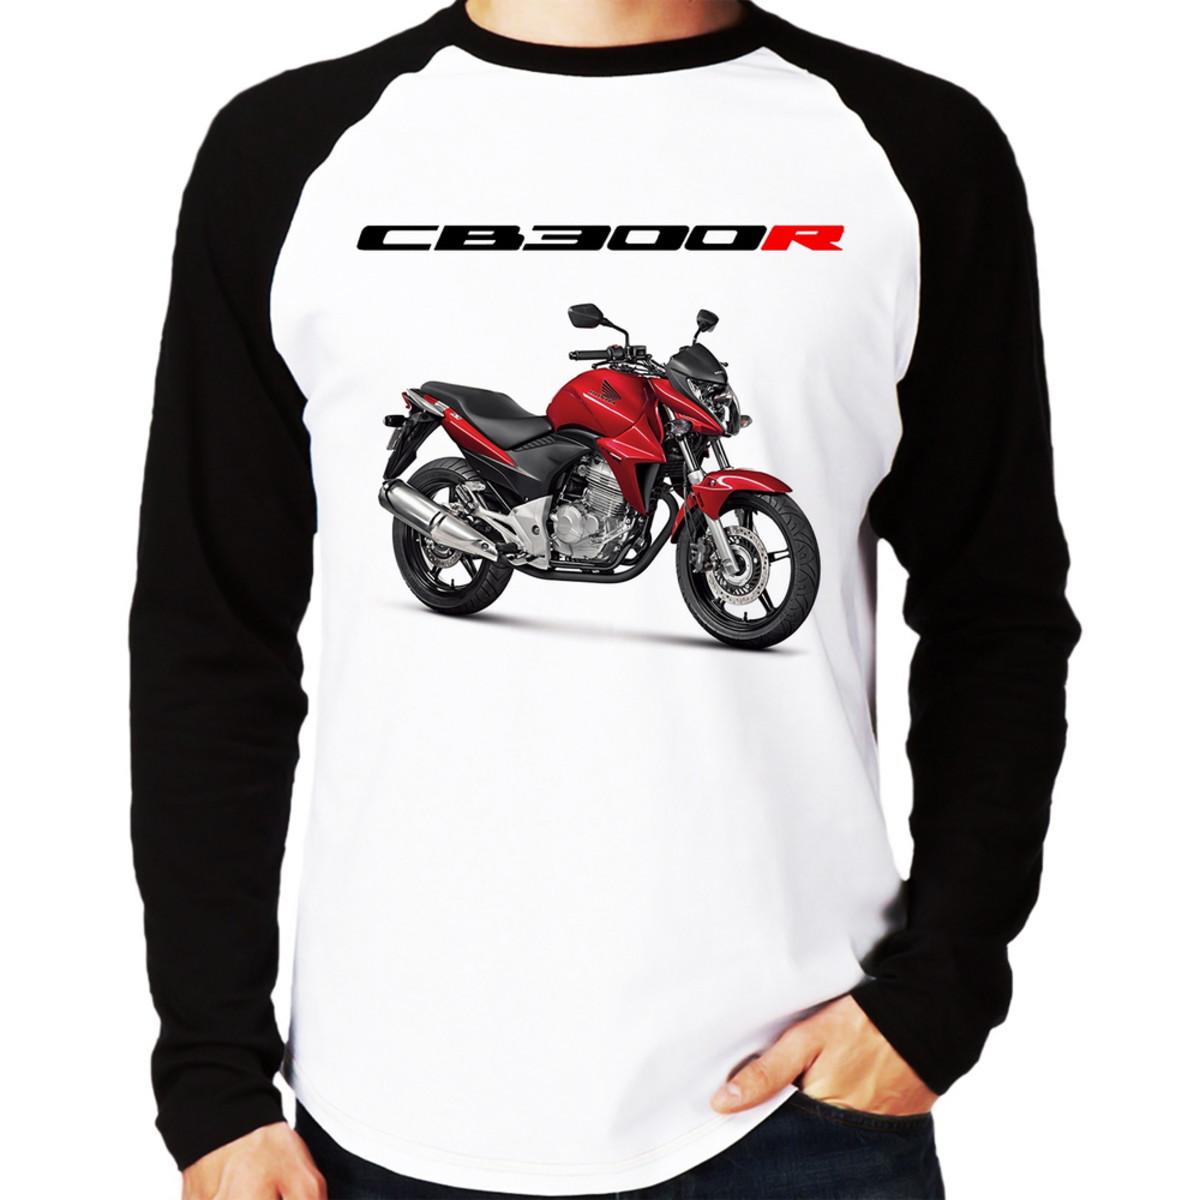 83c5f4ae8d8f2 Camiseta Moto Honda CB 300 R Vermelha Raglan Longa no Elo7